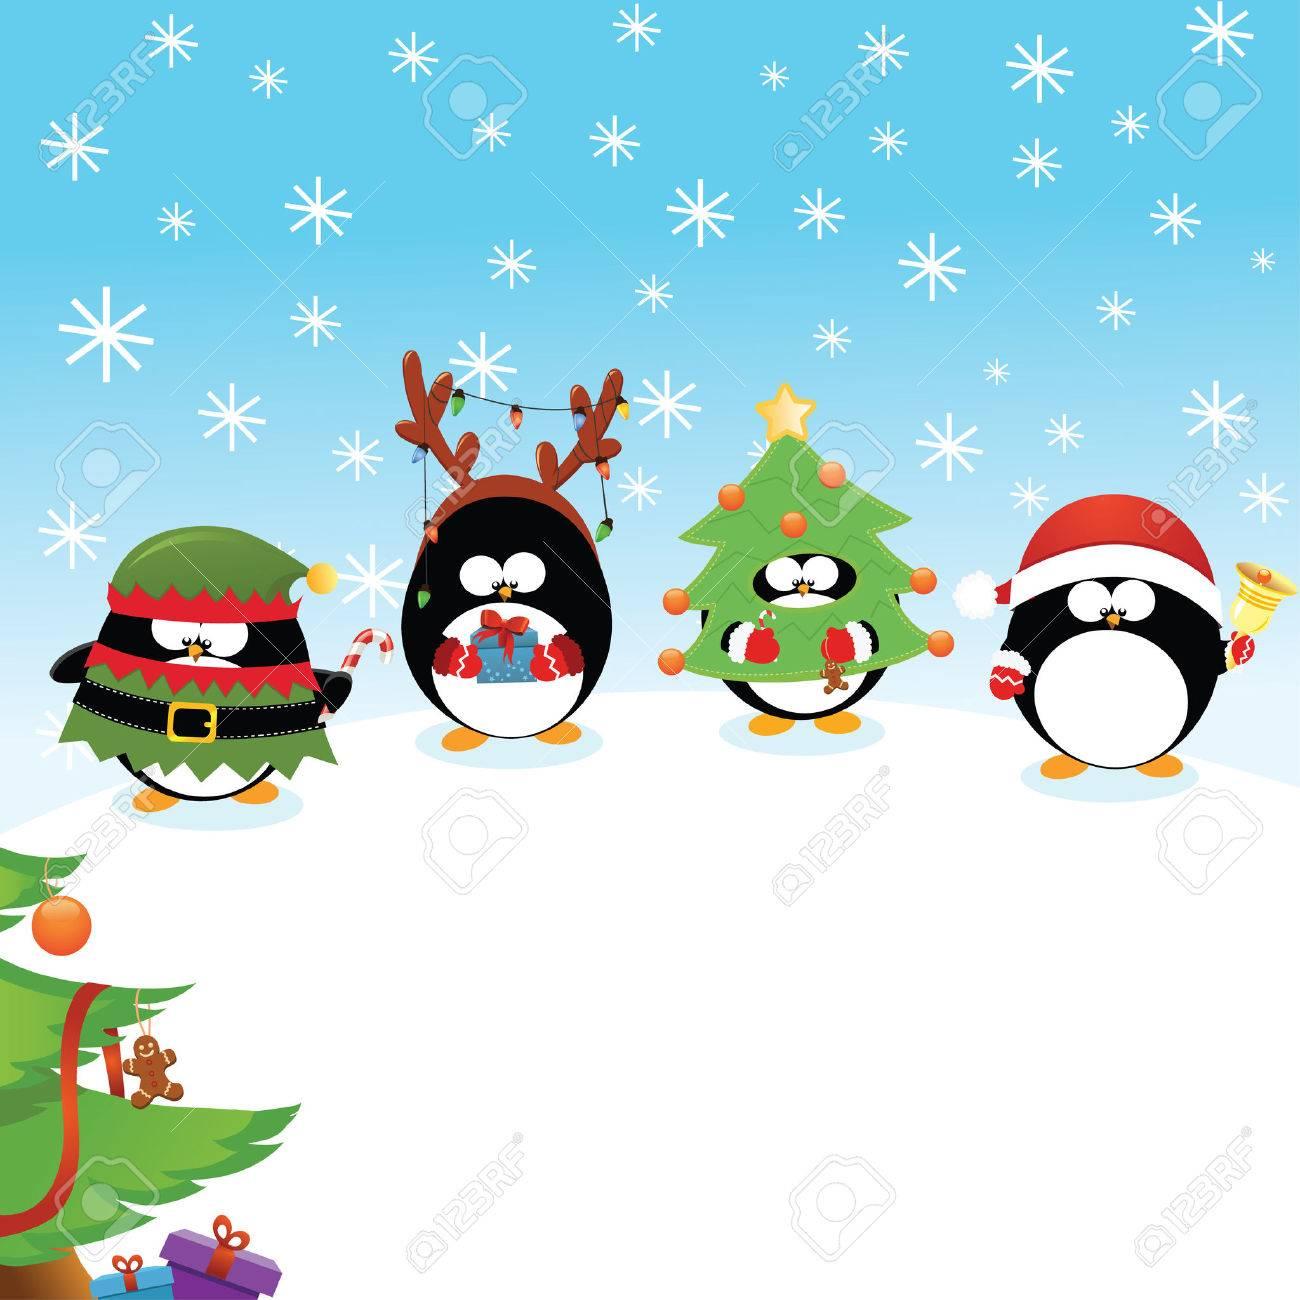 Christmas Penguins Card - 34246072